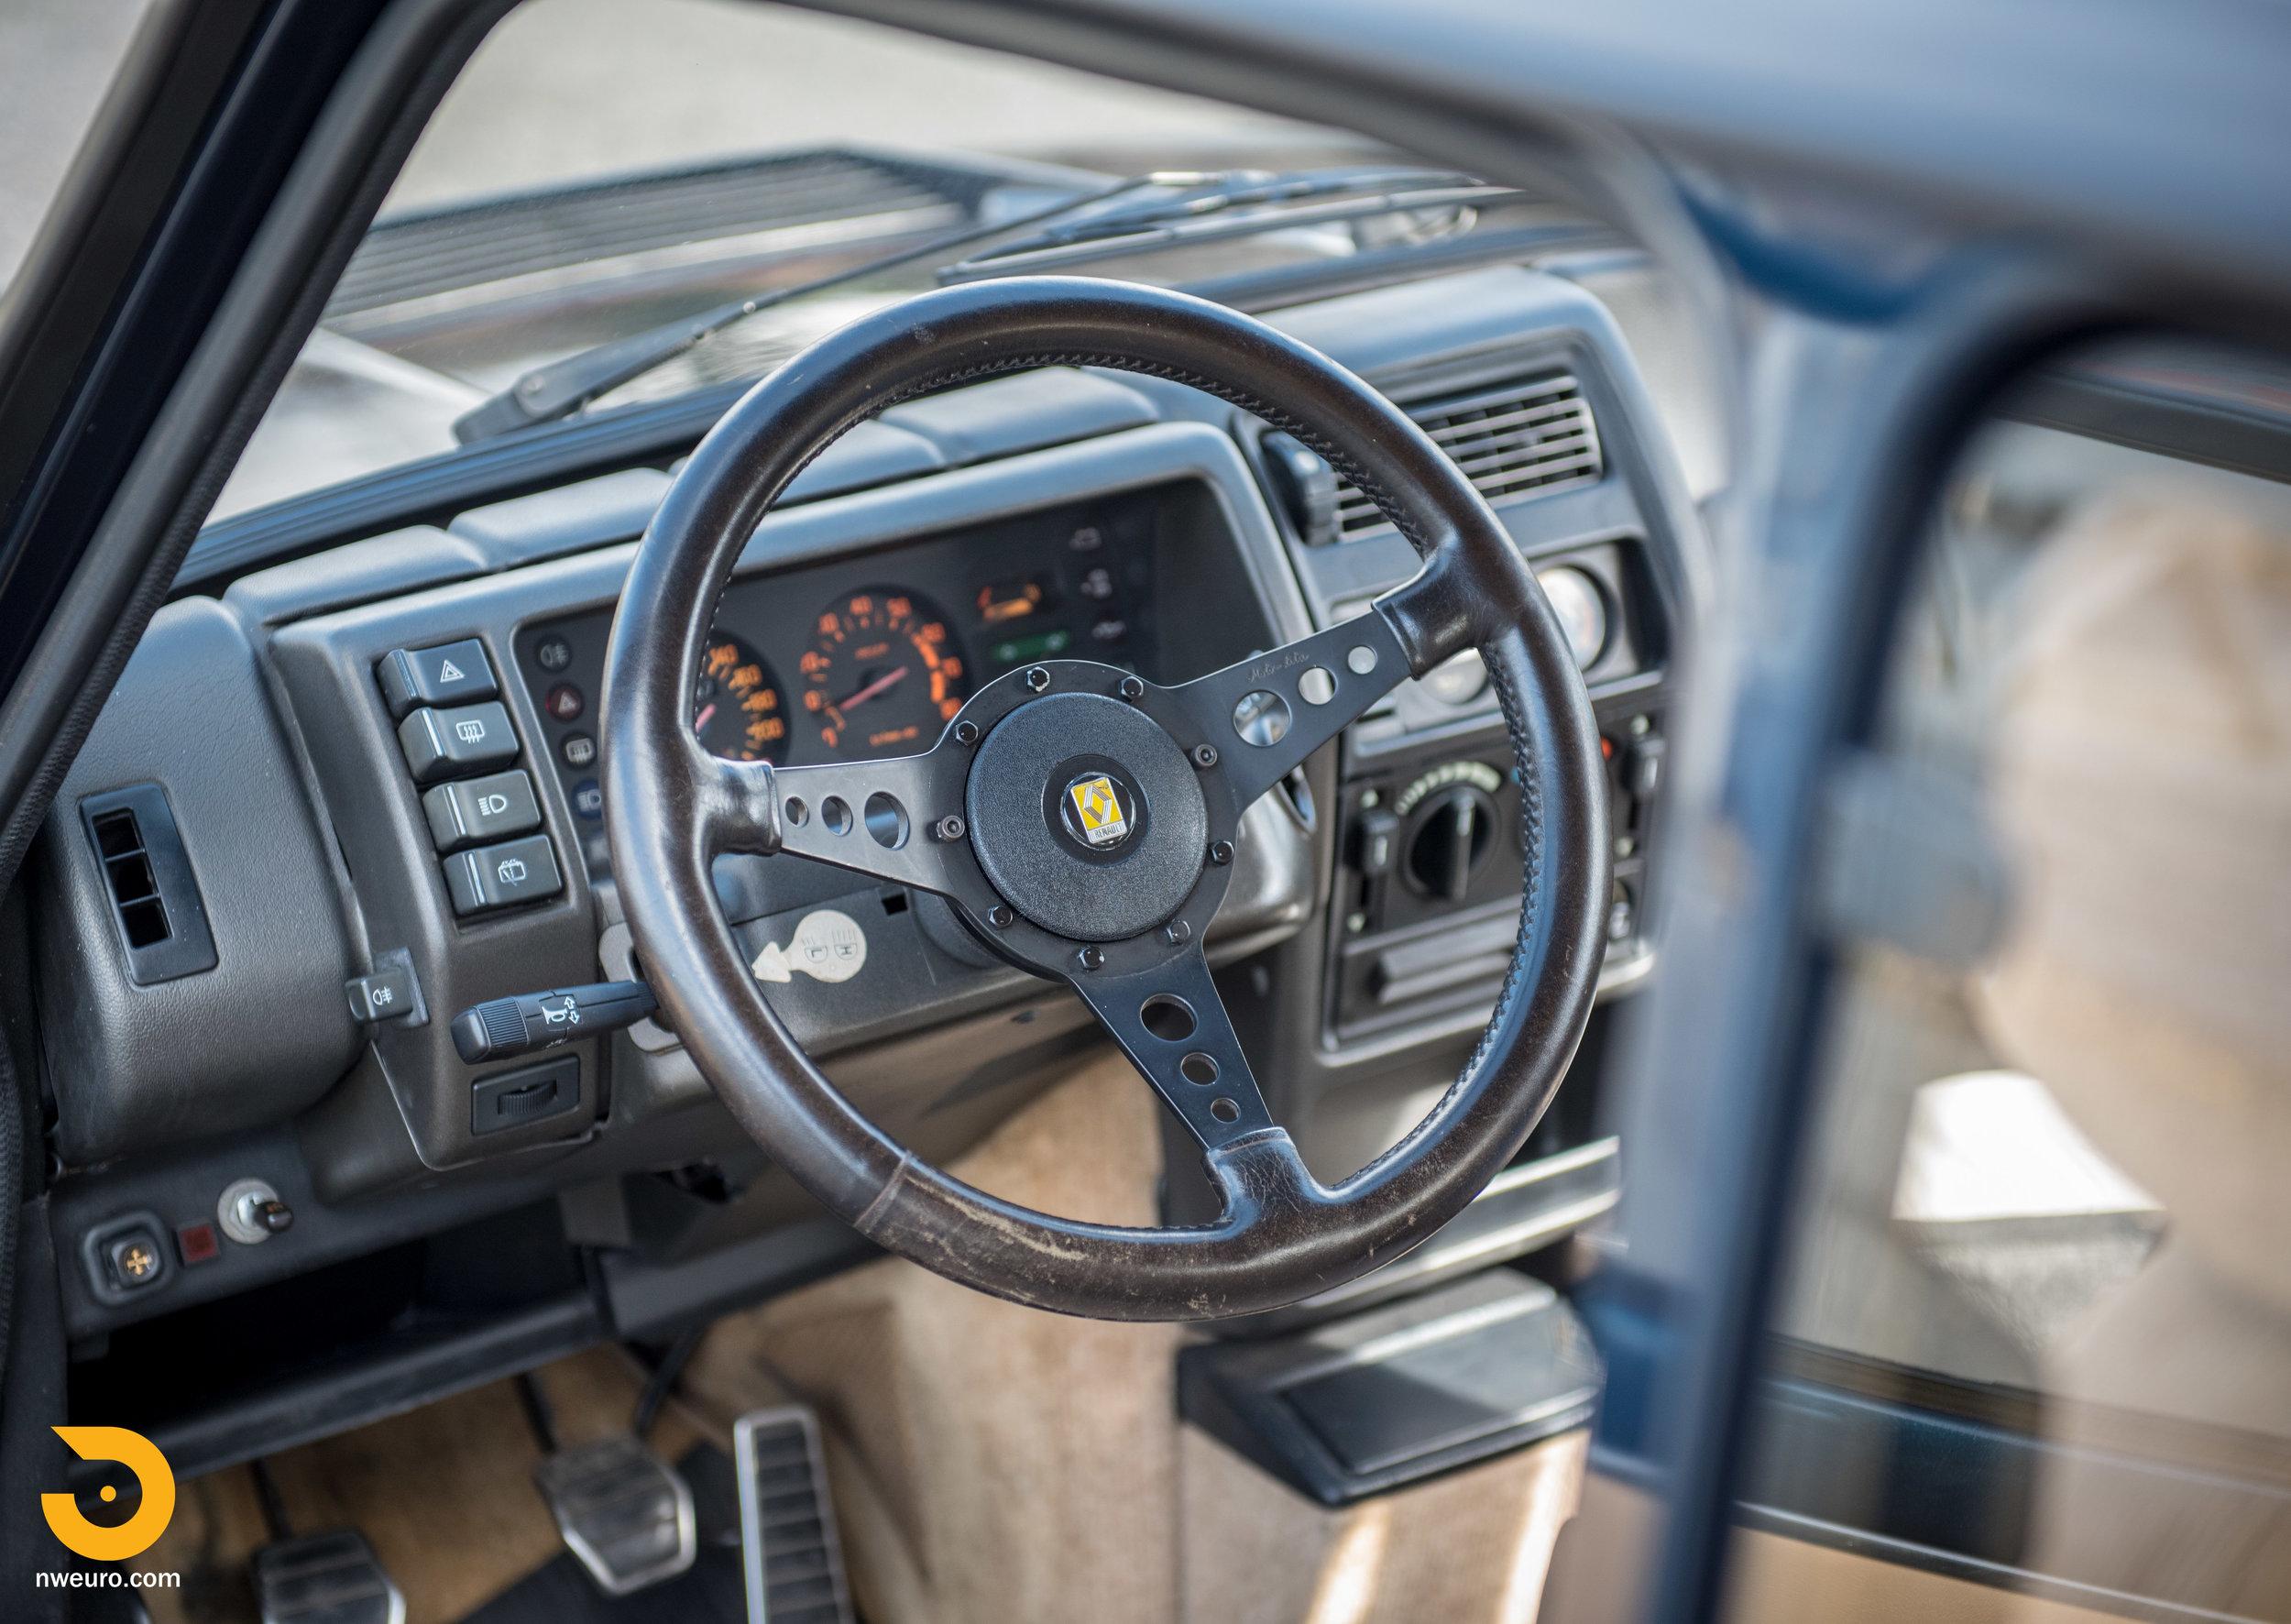 1983 Renault R5 Turbo 2-15.jpg